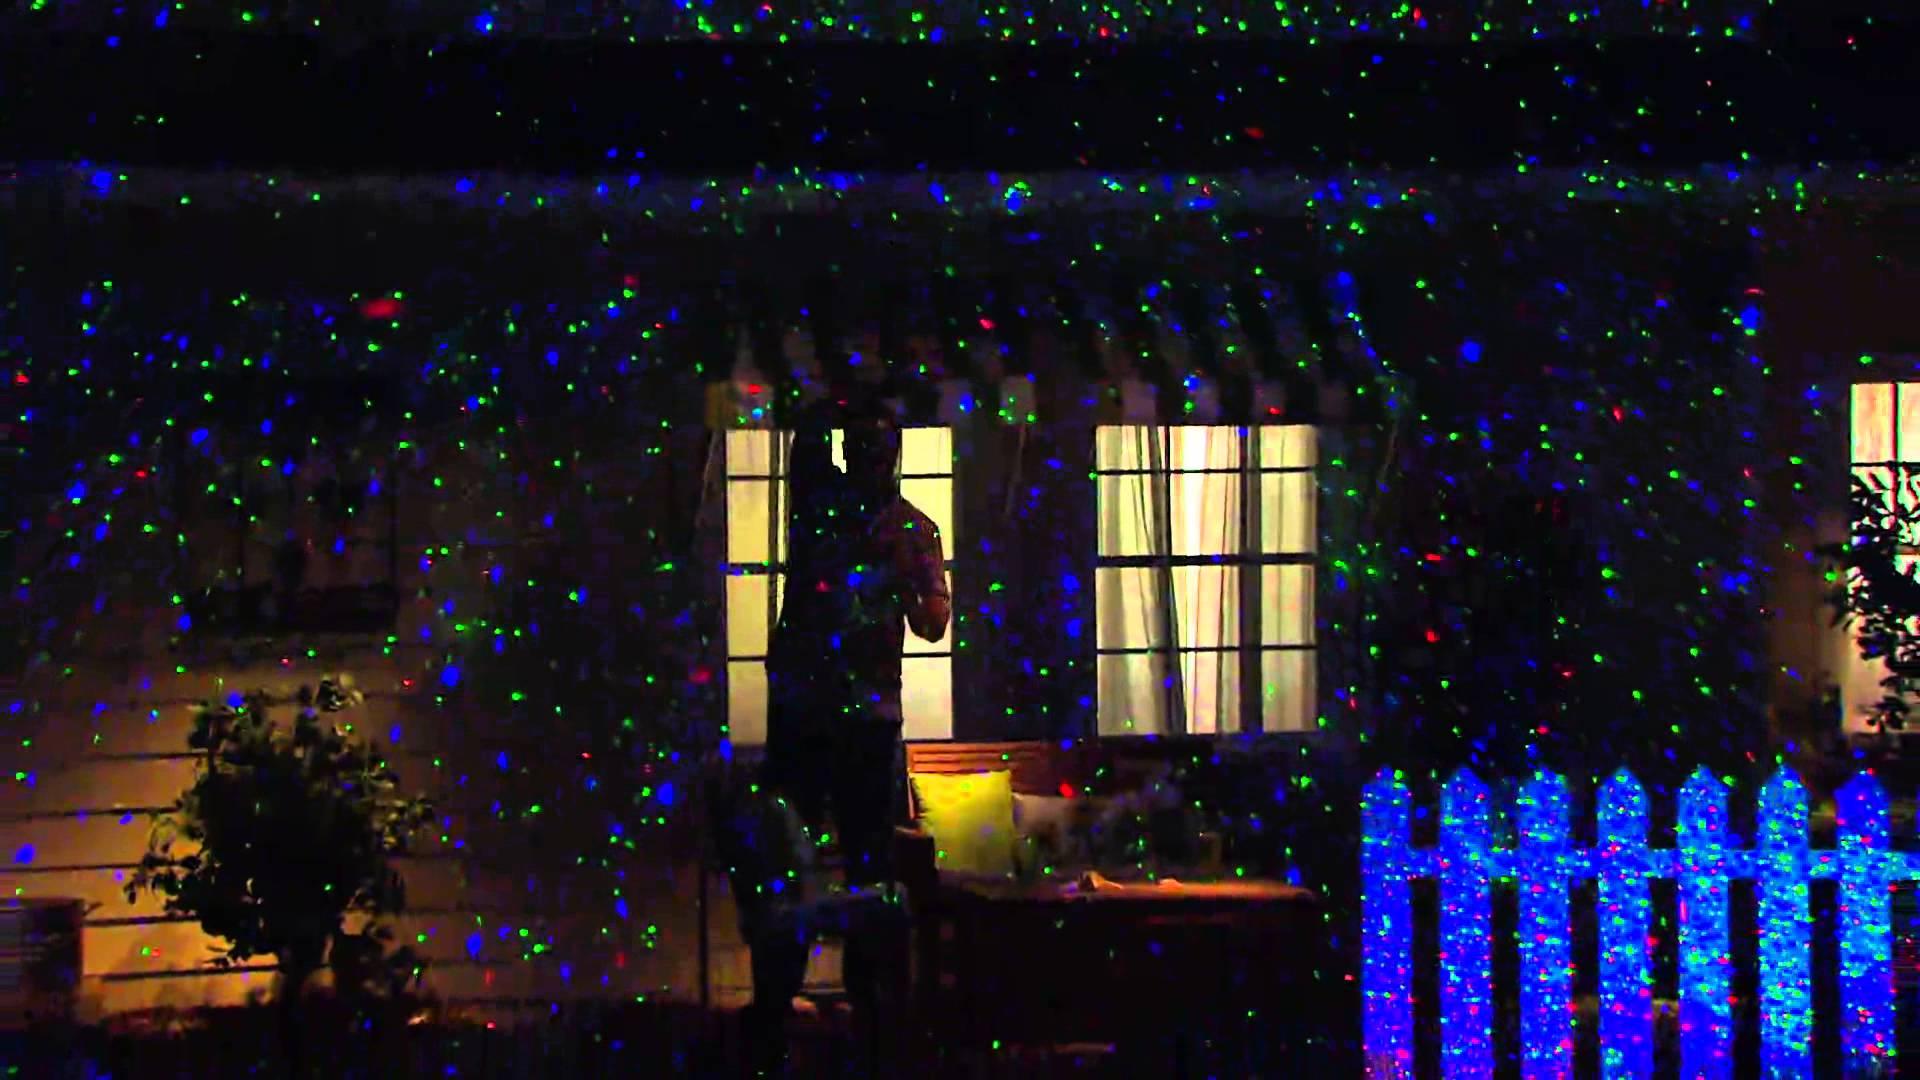 Laser Outdoor Lights Laser outdoor lighting for christmas laser light show christmas make your outdoor amazing with laser outdoor lights warisan lighting workwithnaturefo